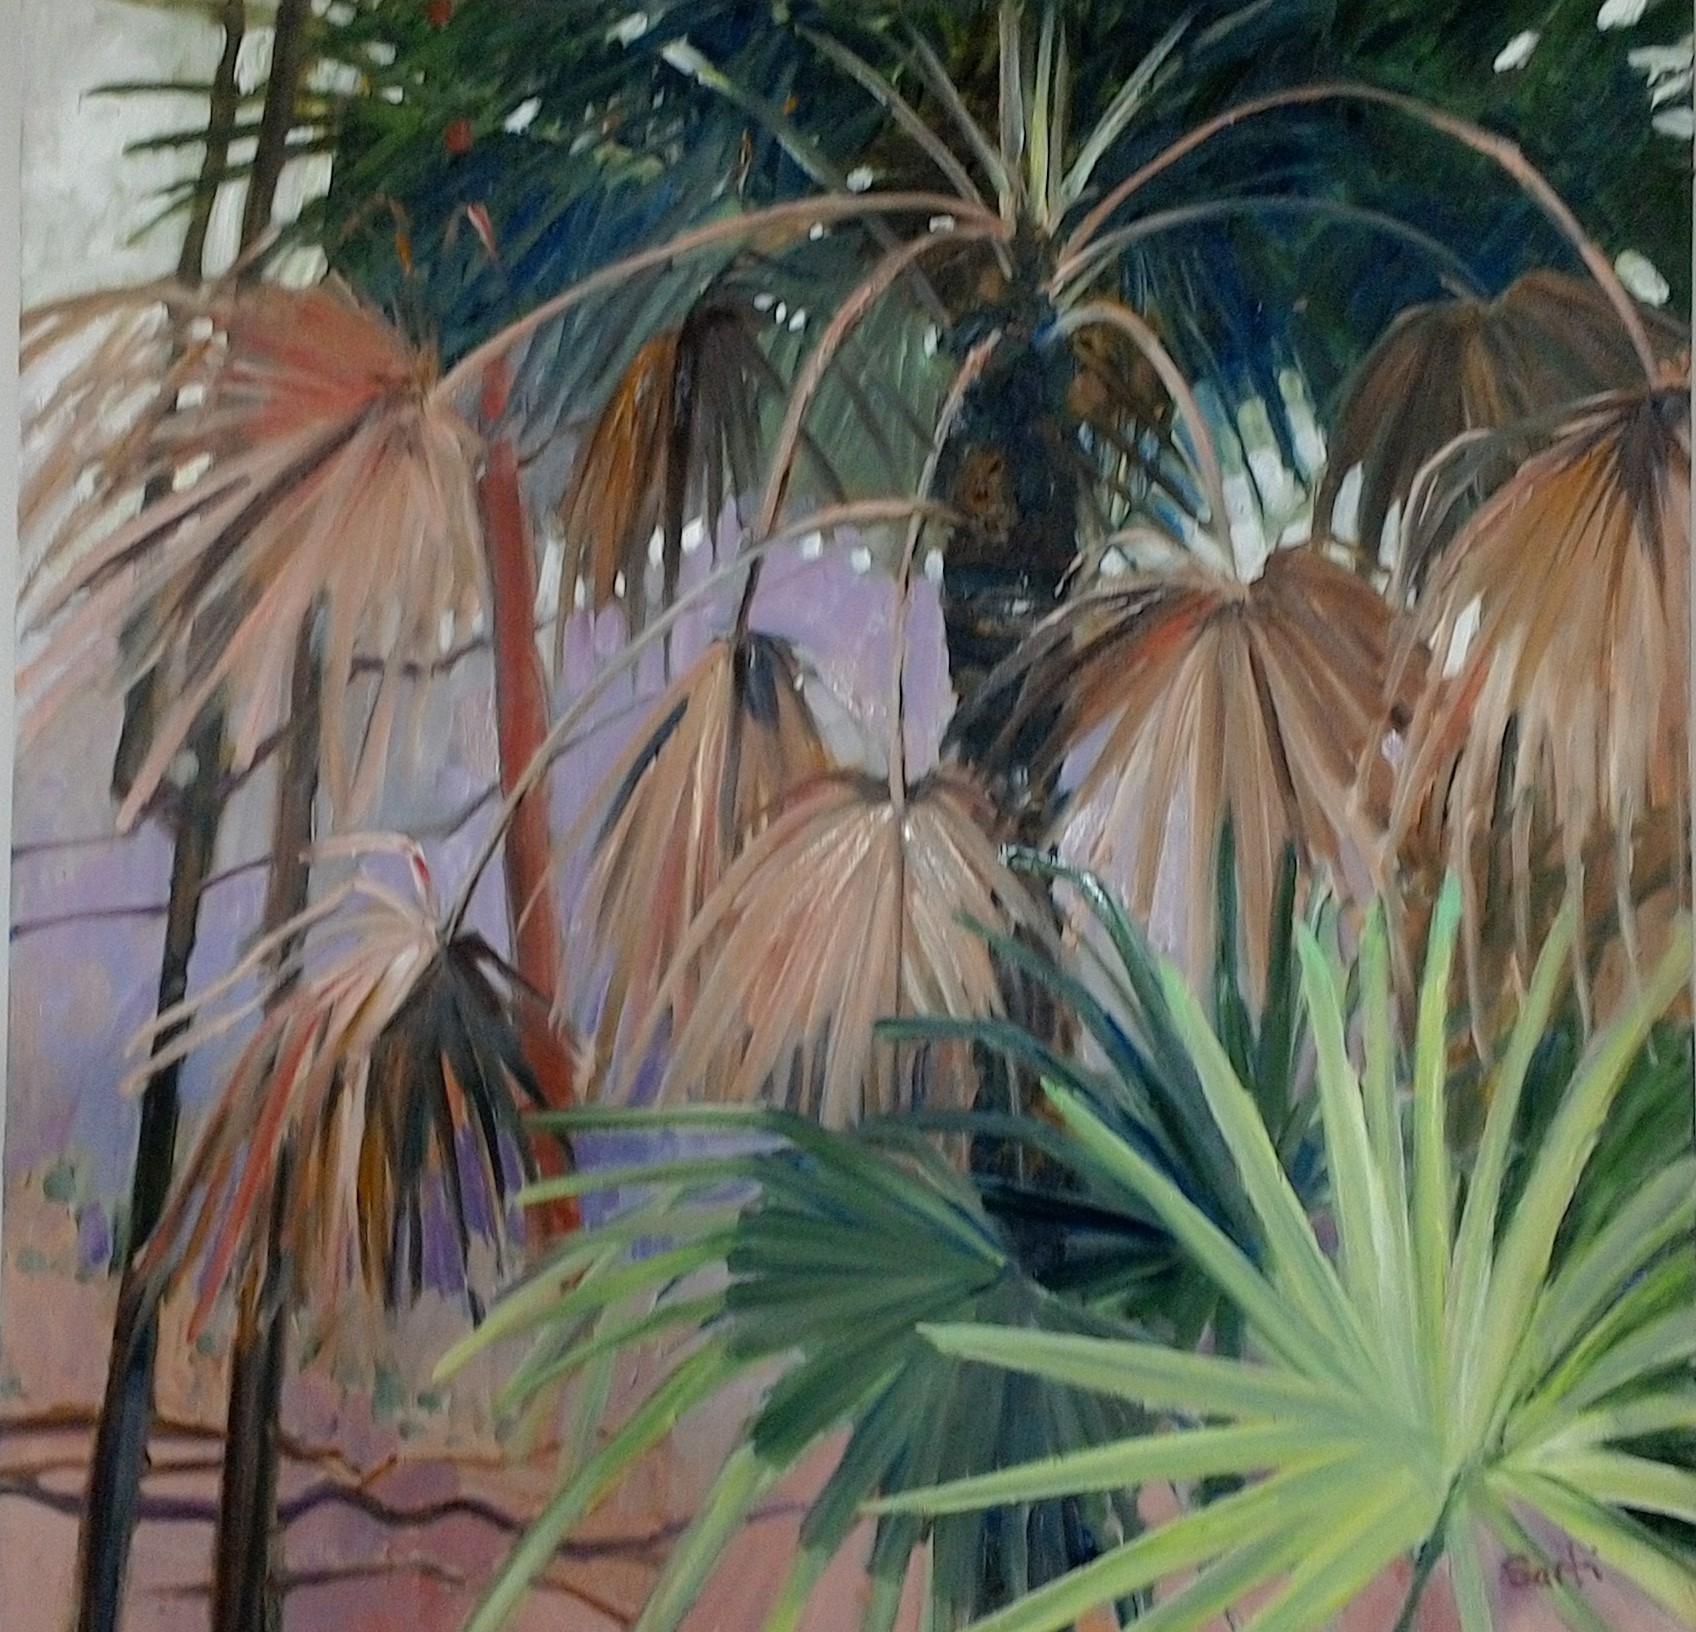 Cabage tree palms 70x70cm $750